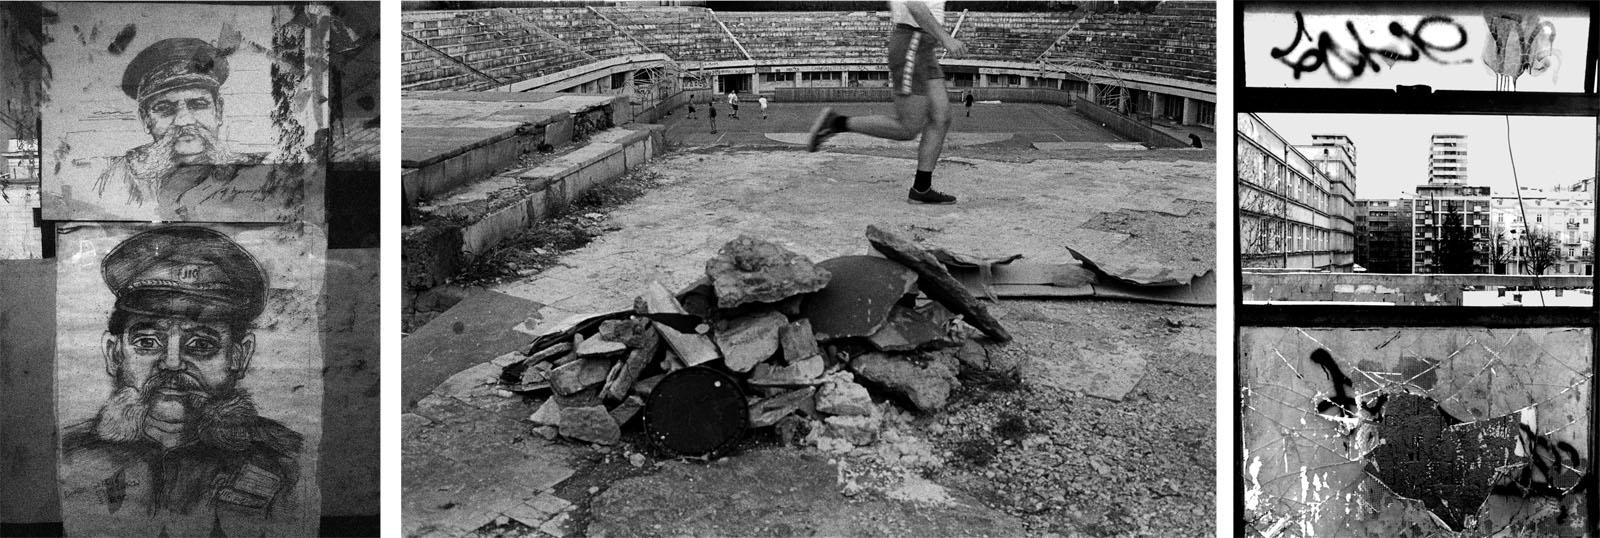 Art and Documentary Photography - Loading BGD___Fabio_Sgroi_037.jpg